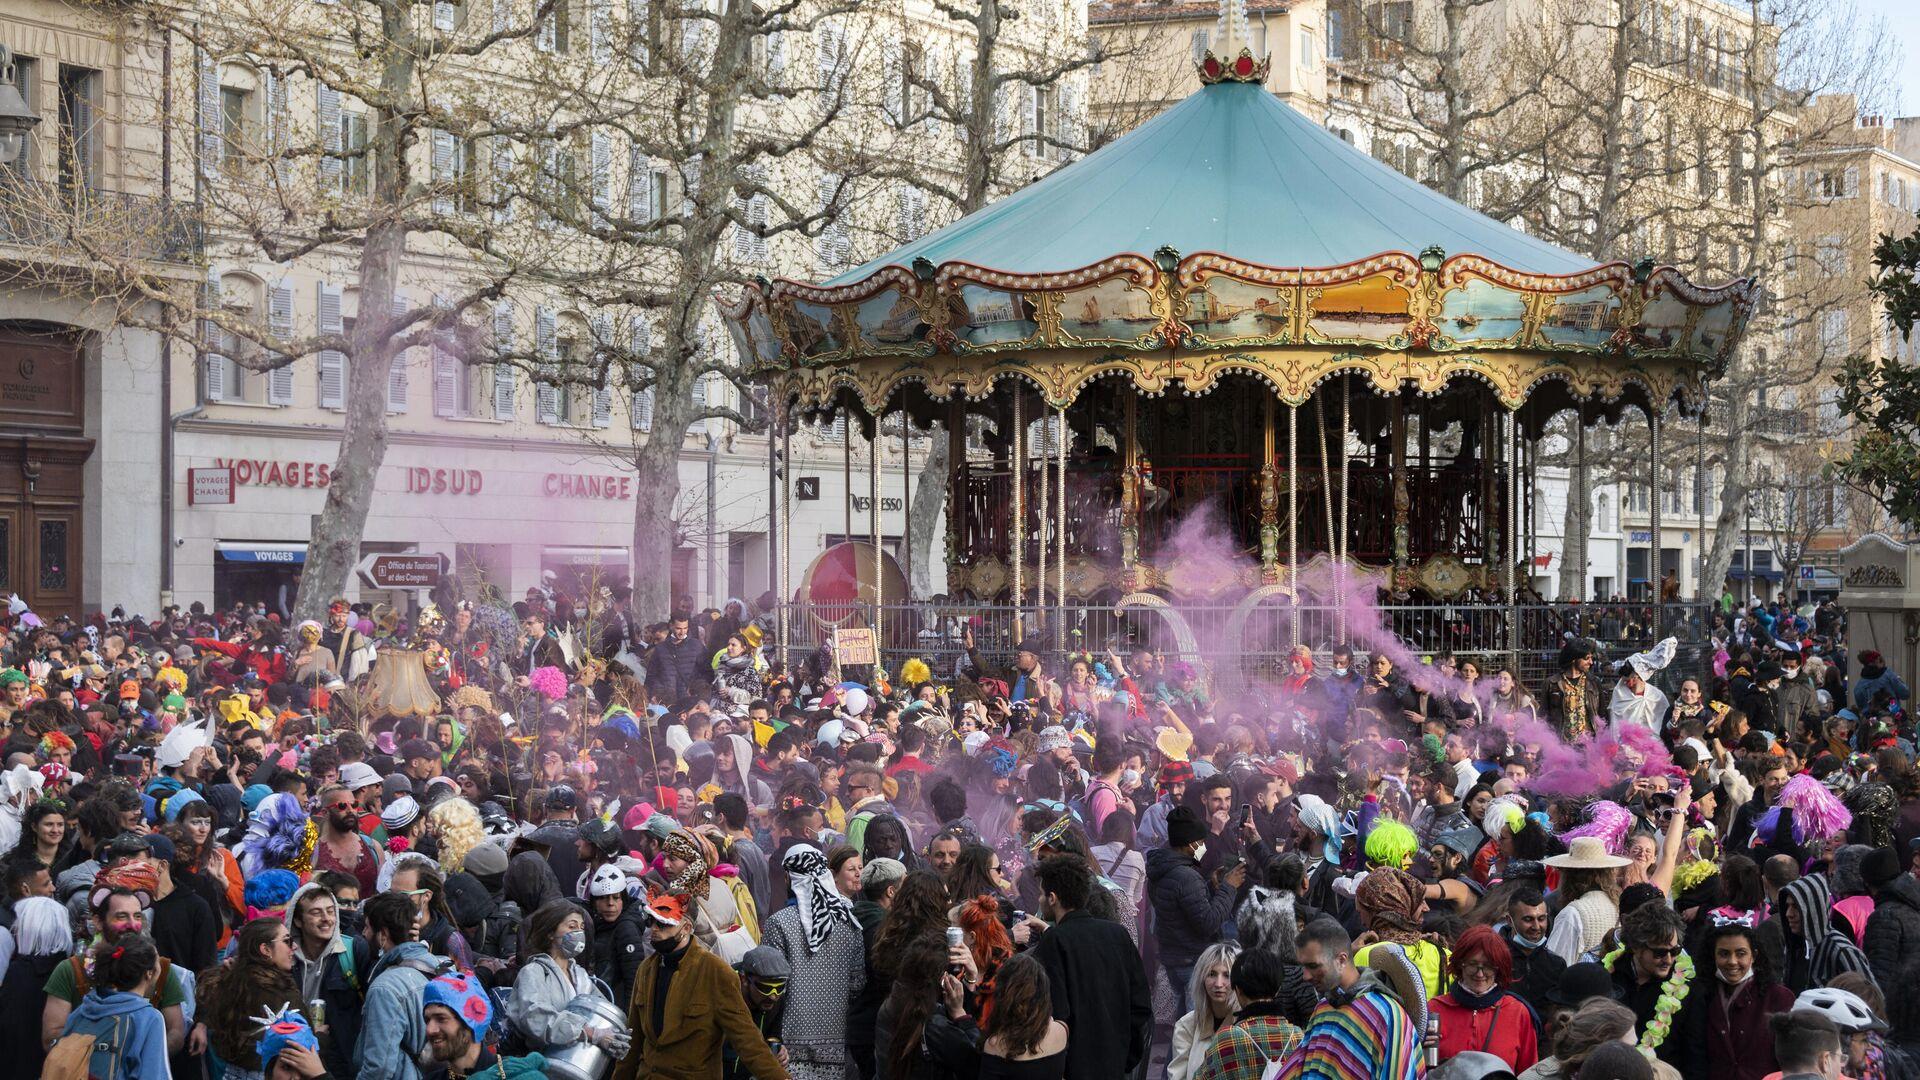 Carnaval ilegal en Marsella, Francia - Sputnik Mundo, 1920, 22.03.2021